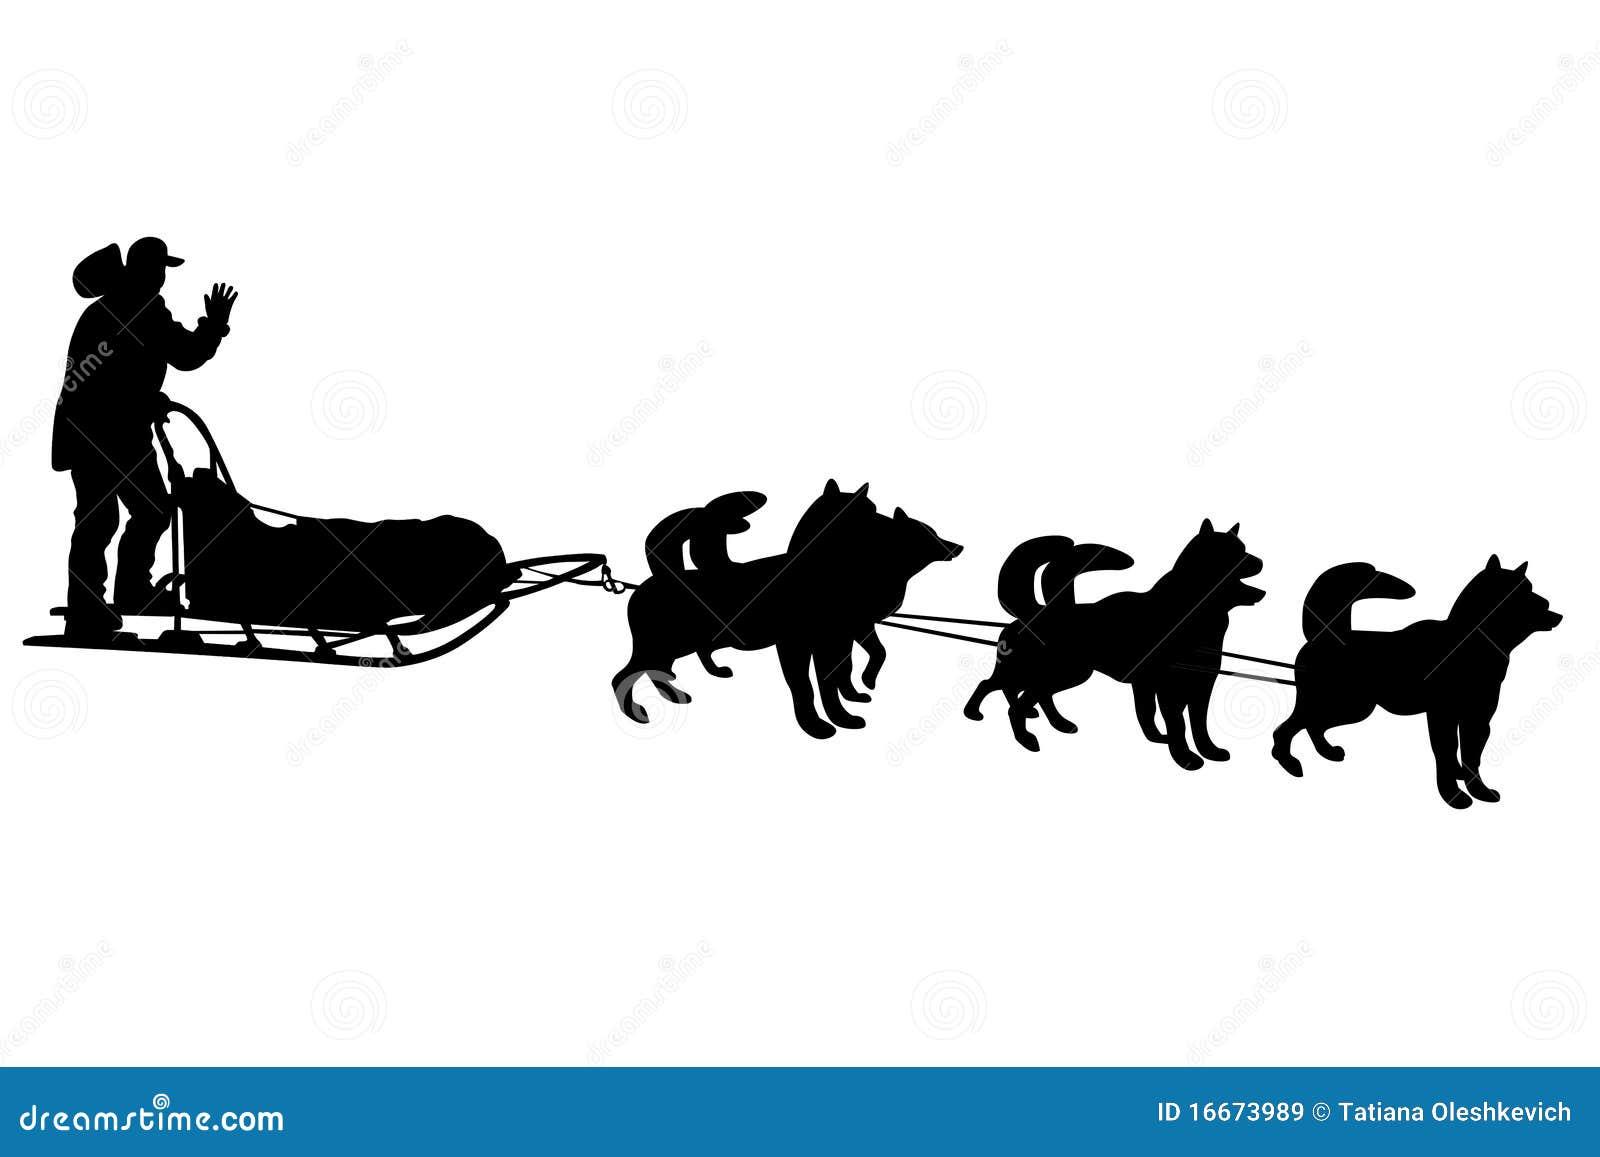 dog racing clip art - photo #37